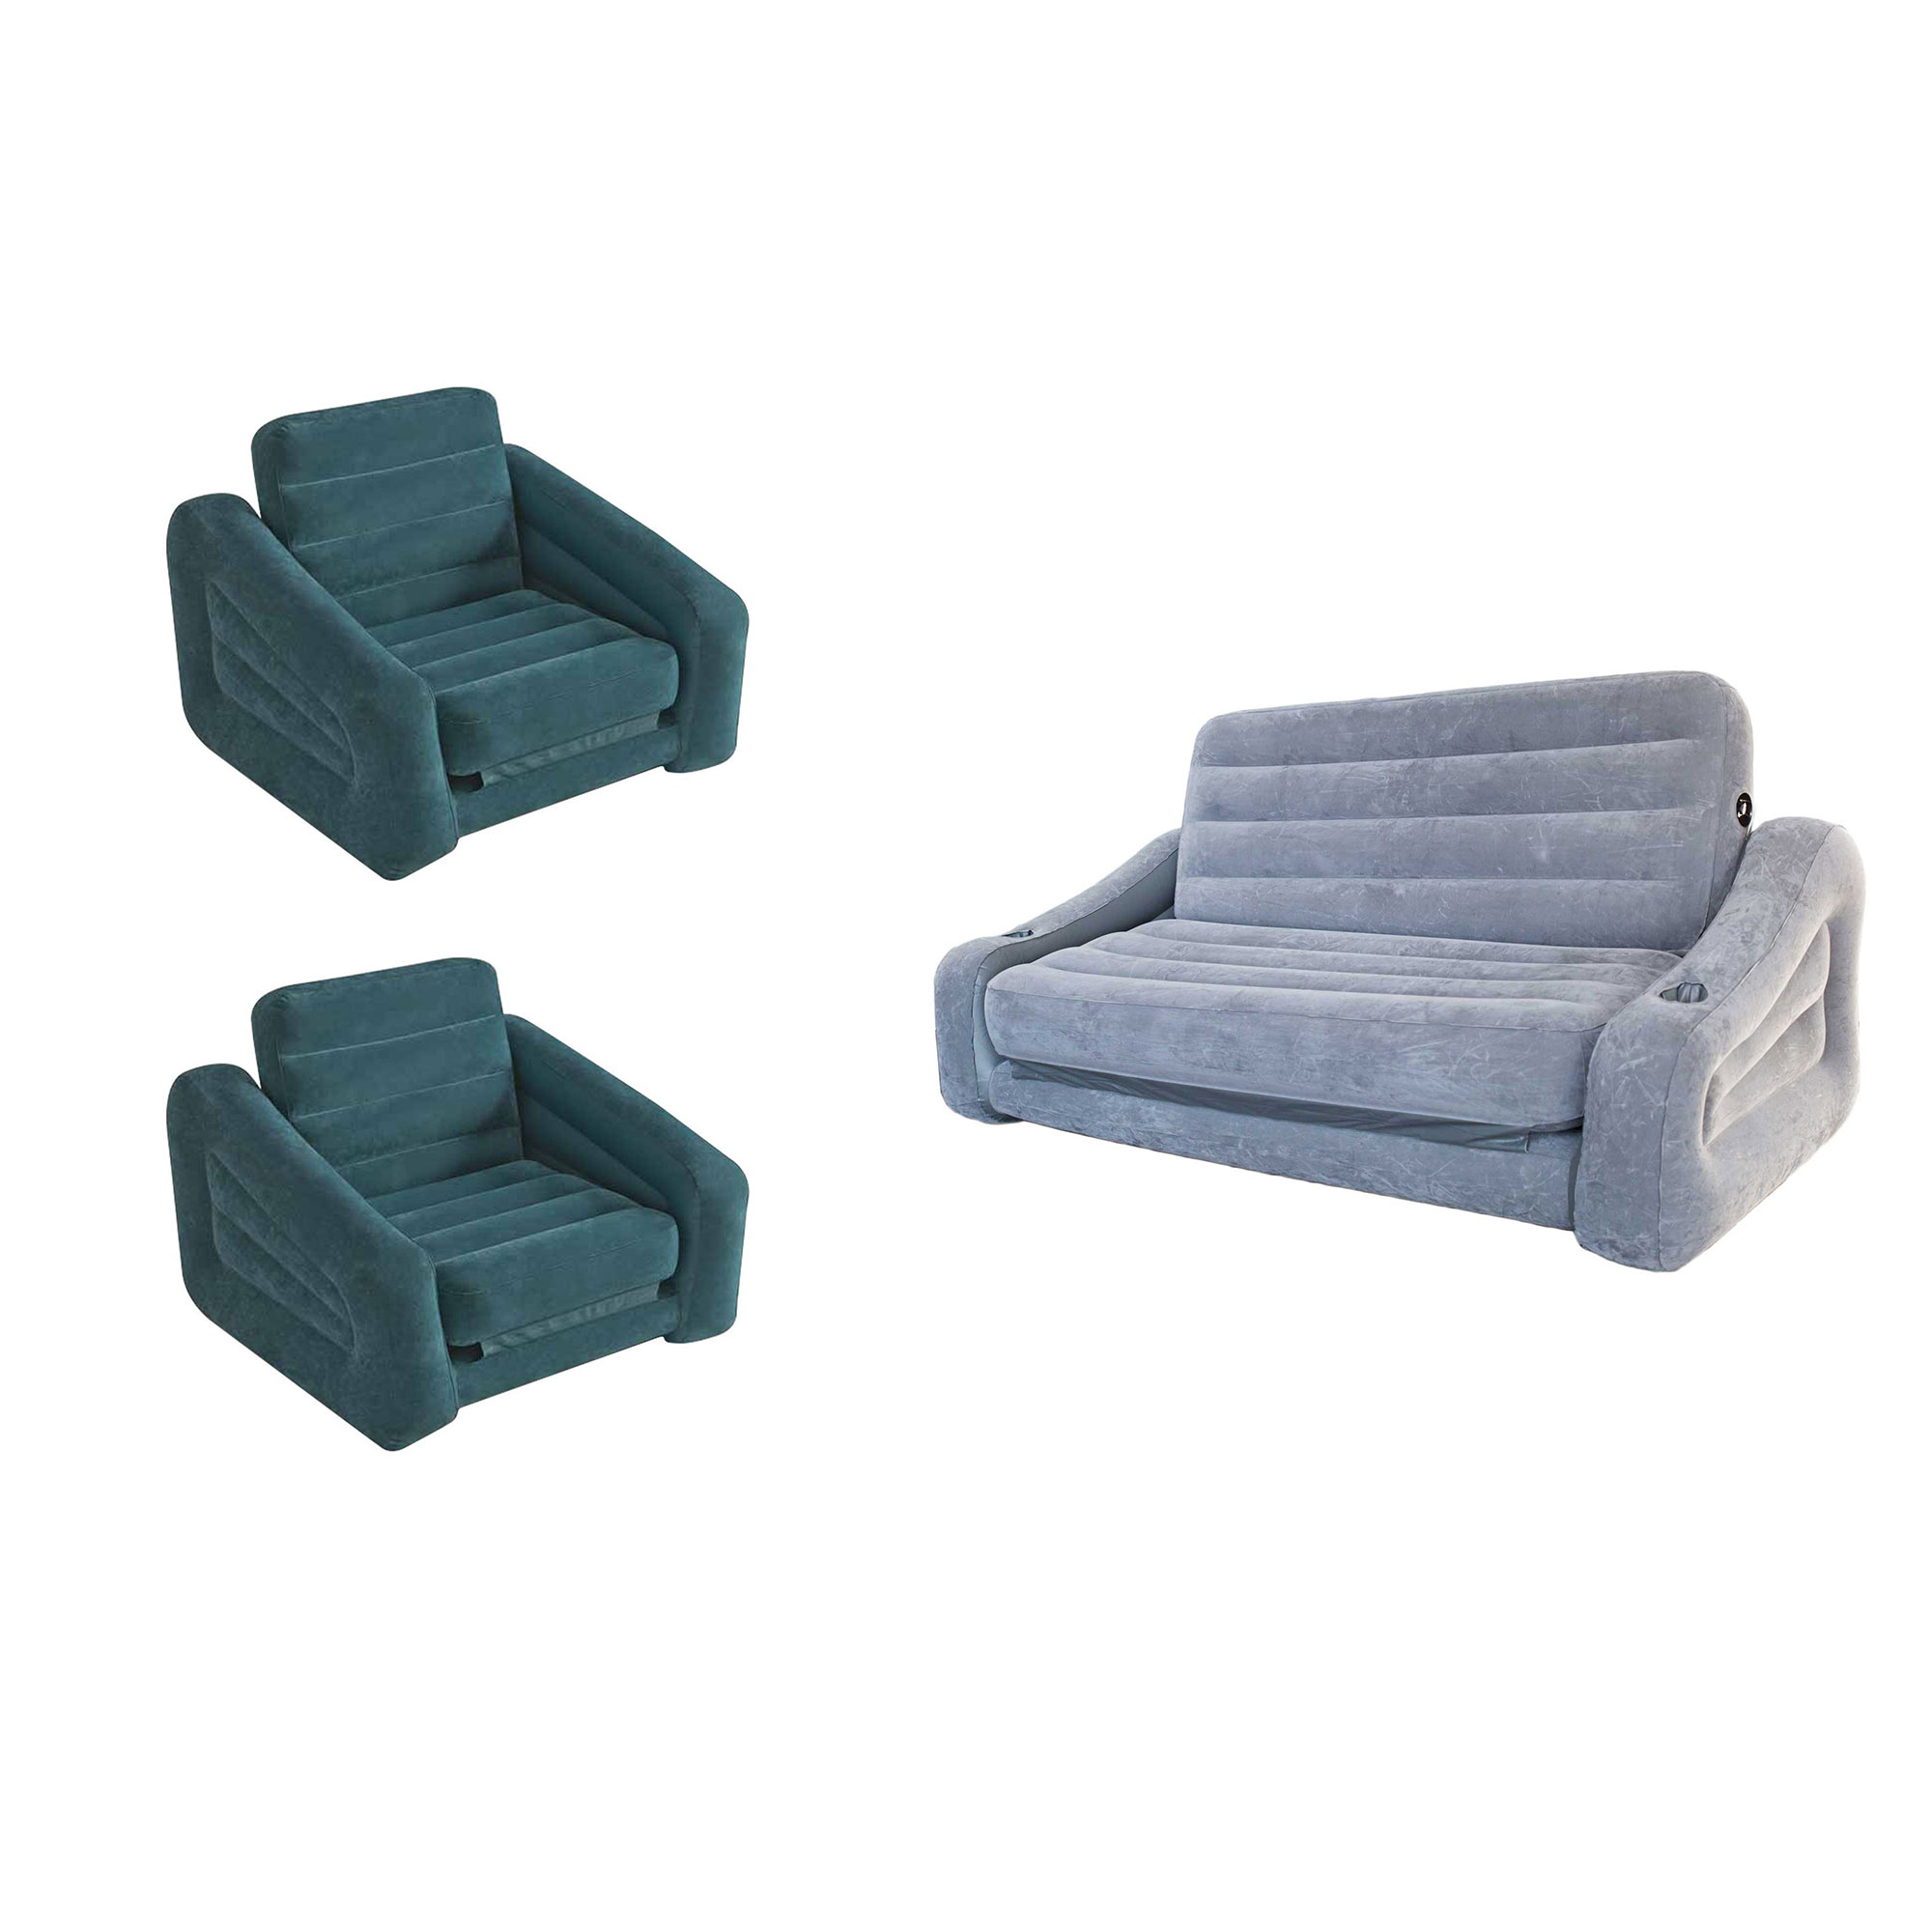 intex air chair eames dowel replica inflatable pull out sofa queen mattress bed sleeper 2 pack walmart com